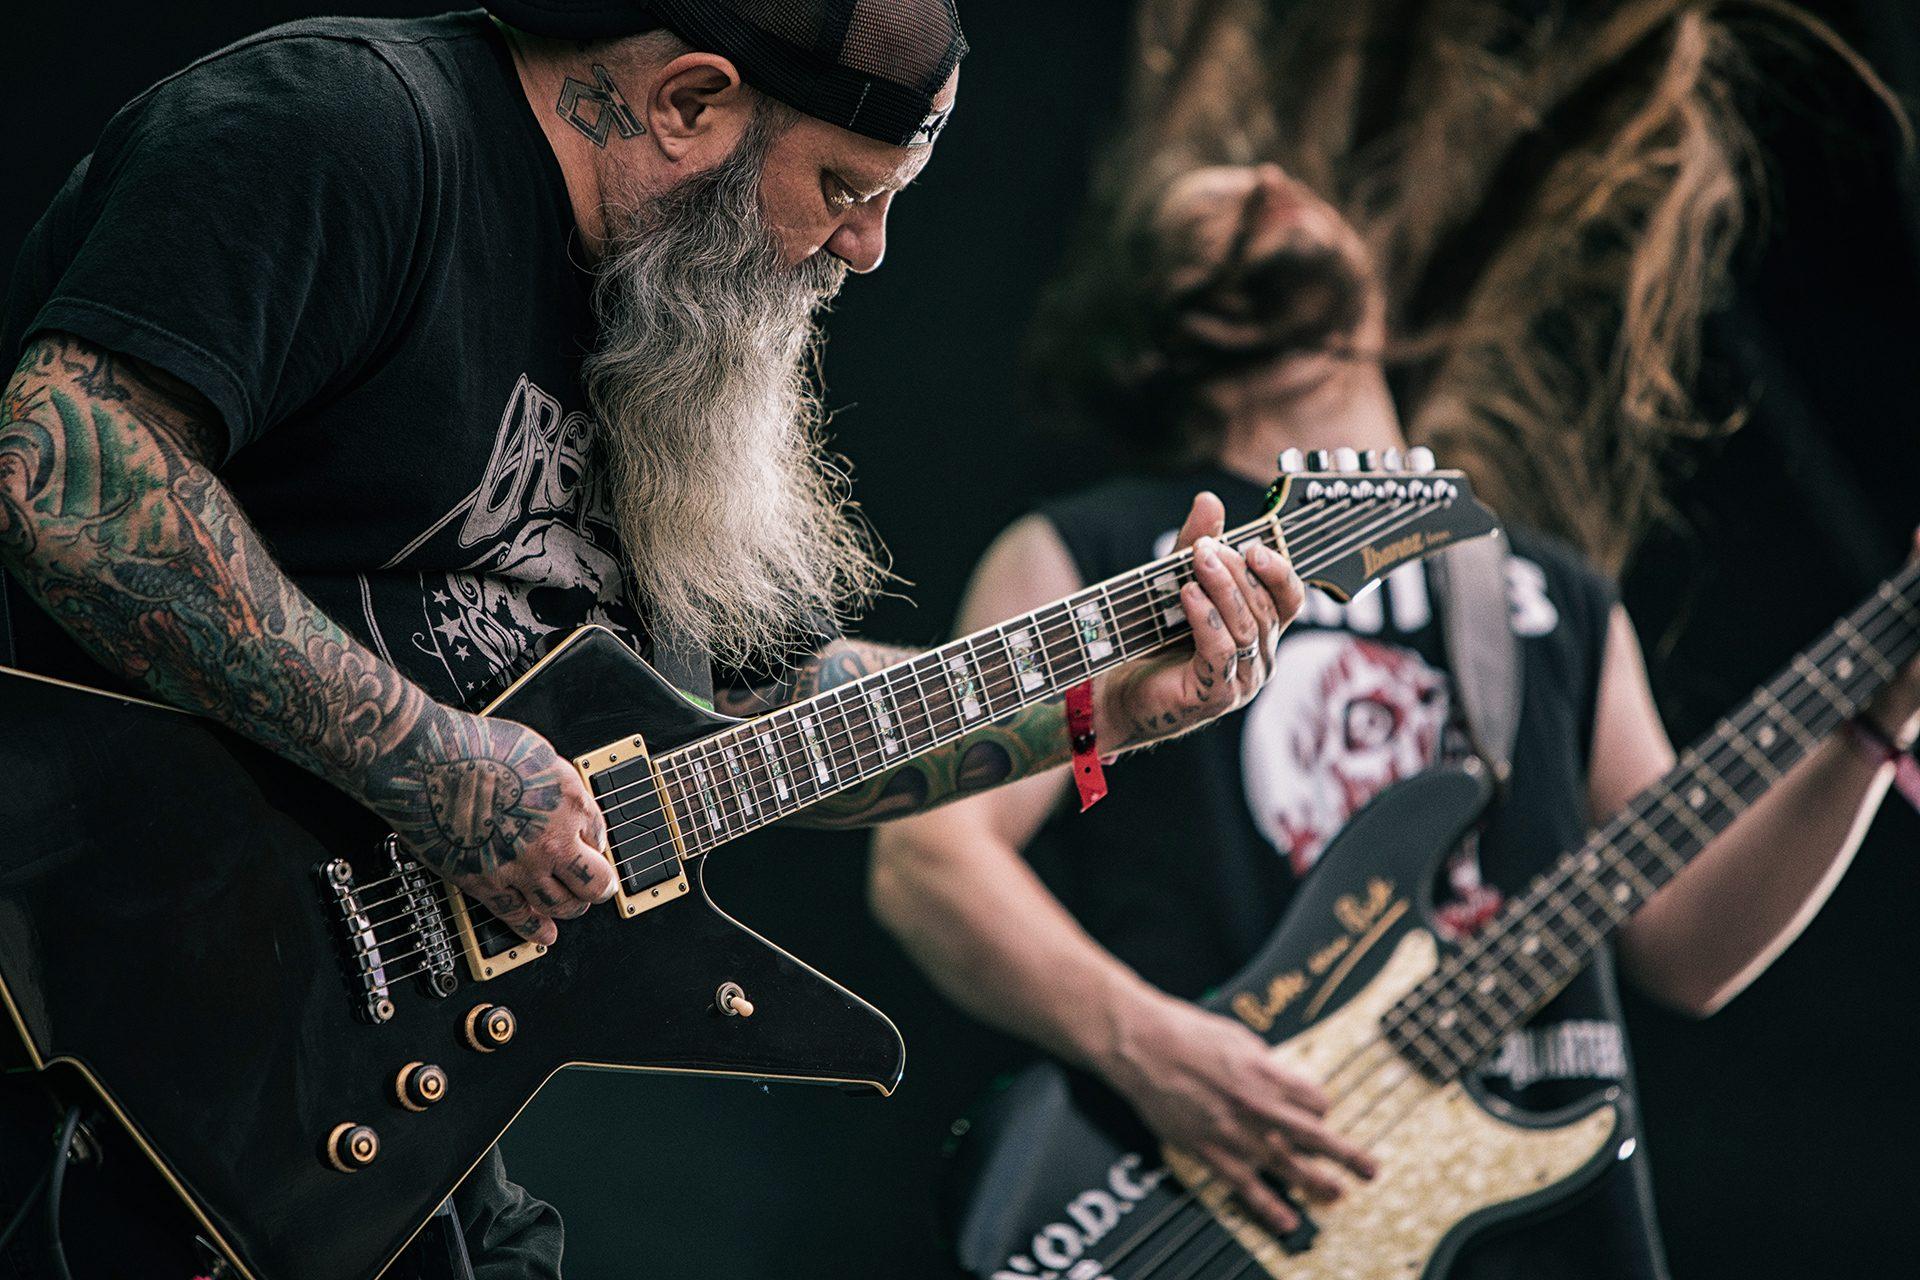 Kirk Windstein, Crowbar band, vocalist, Tuska metal festival